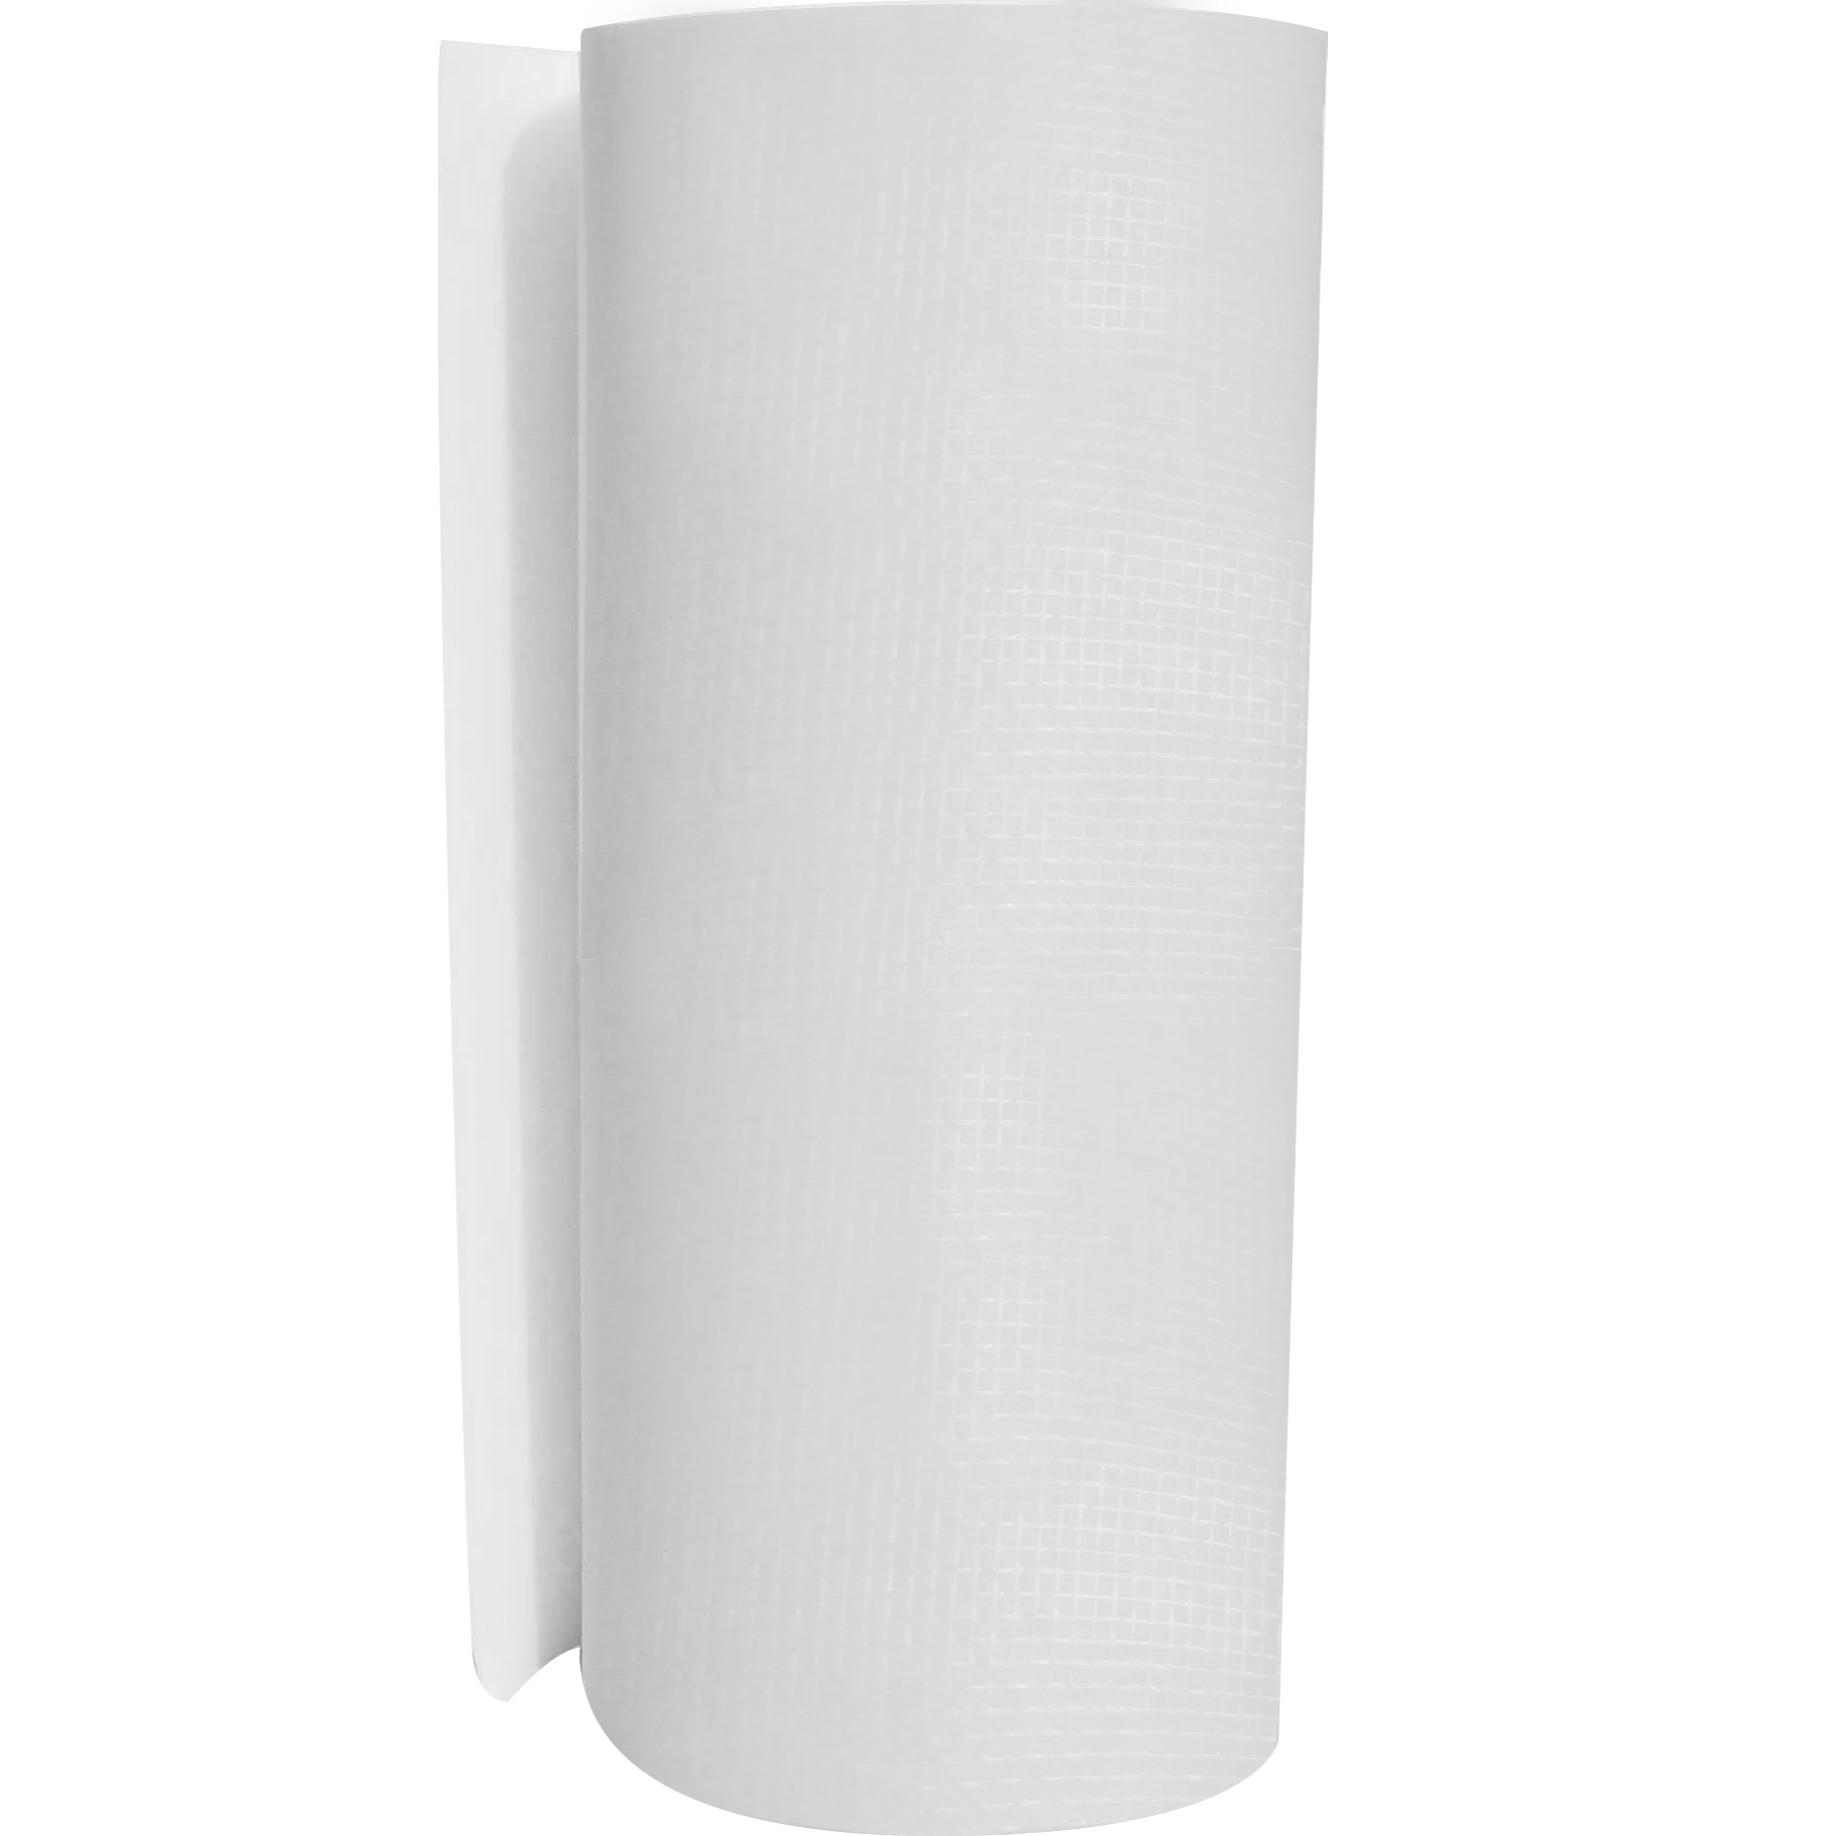 High temperature resistant ceiling filter